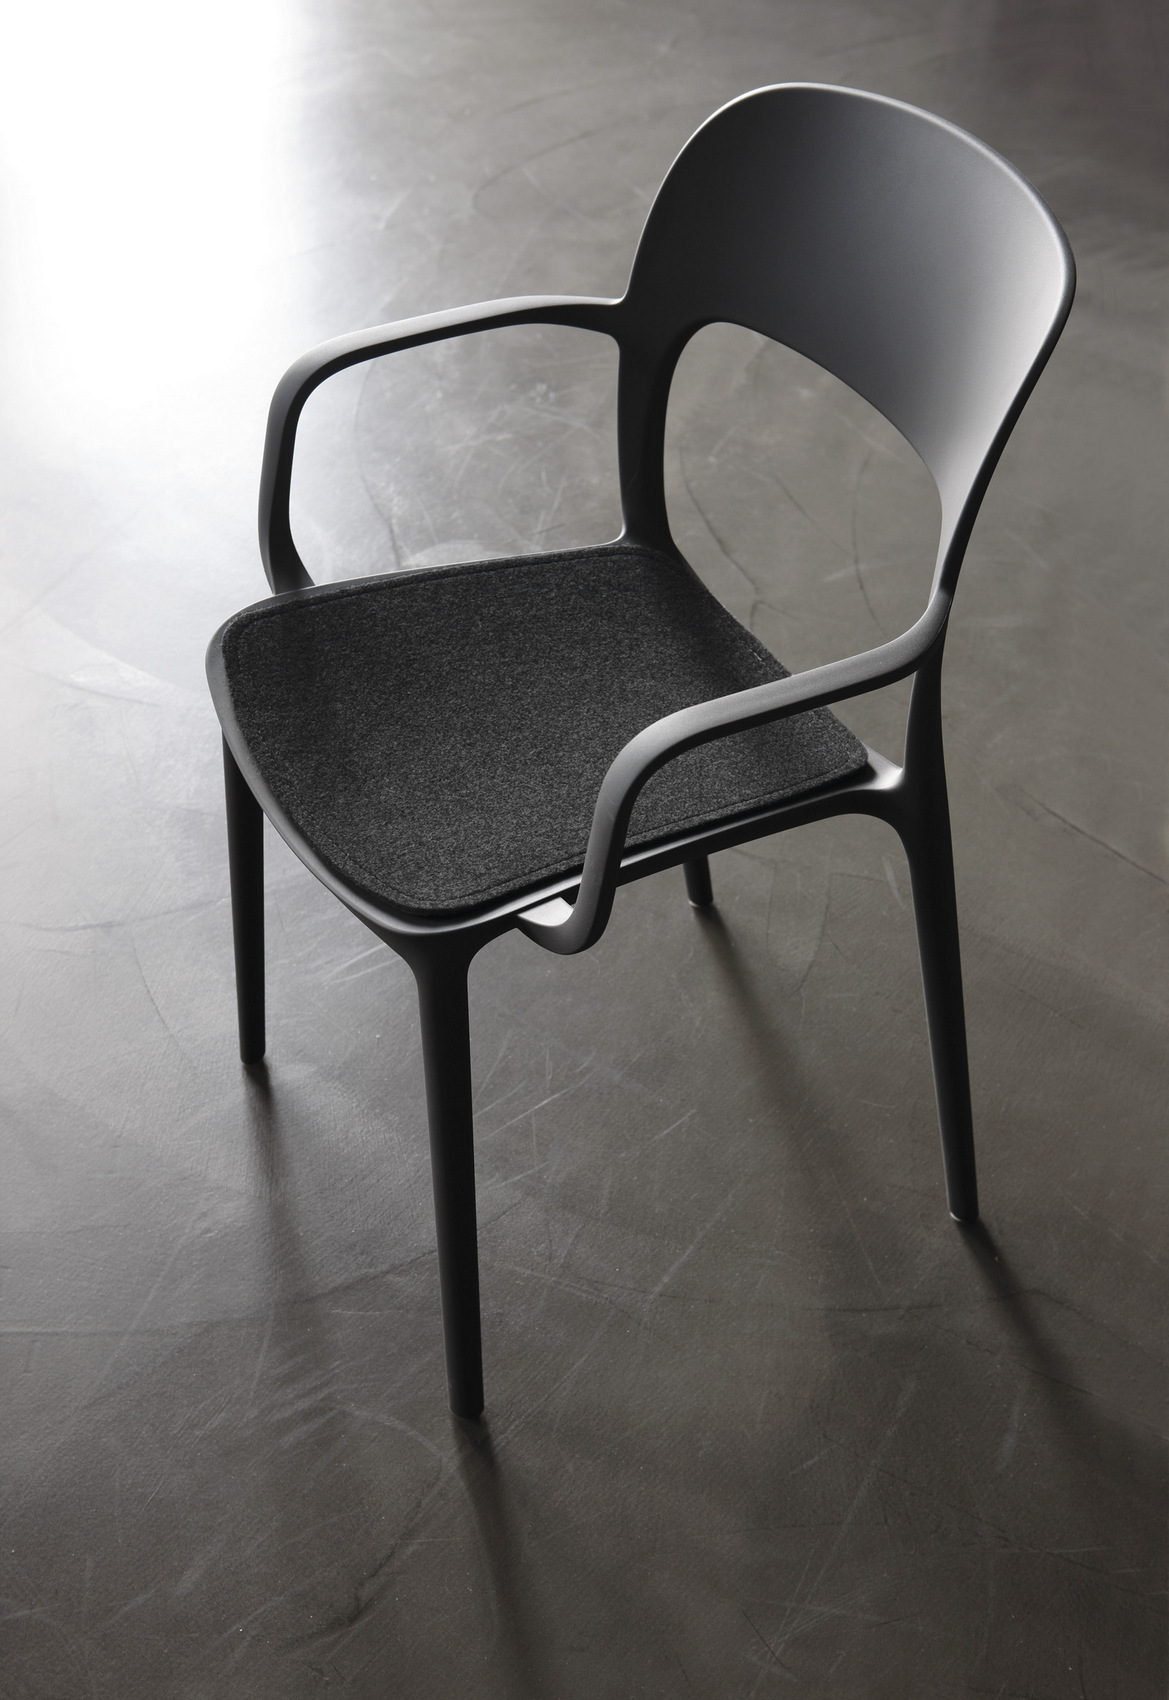 Gipsy sedia con braccioli by bontempi casa design archirivolto - Sedia polipropilene impilabile ...